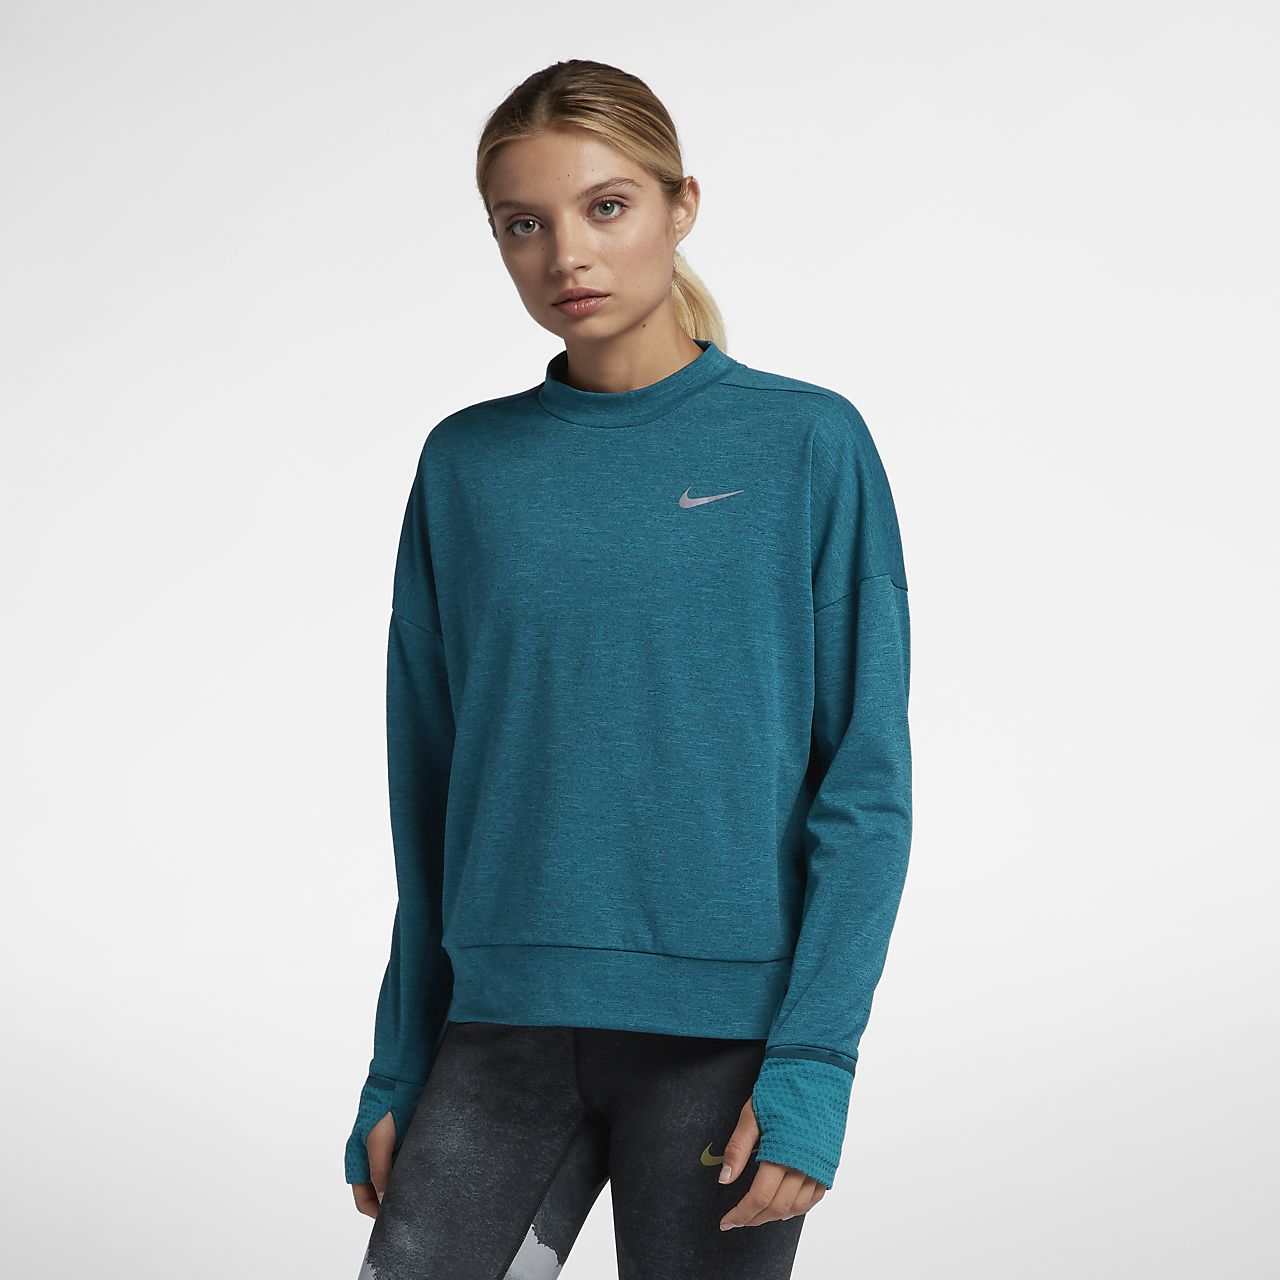 Nike ThermaElement 女子长袖跑步上衣